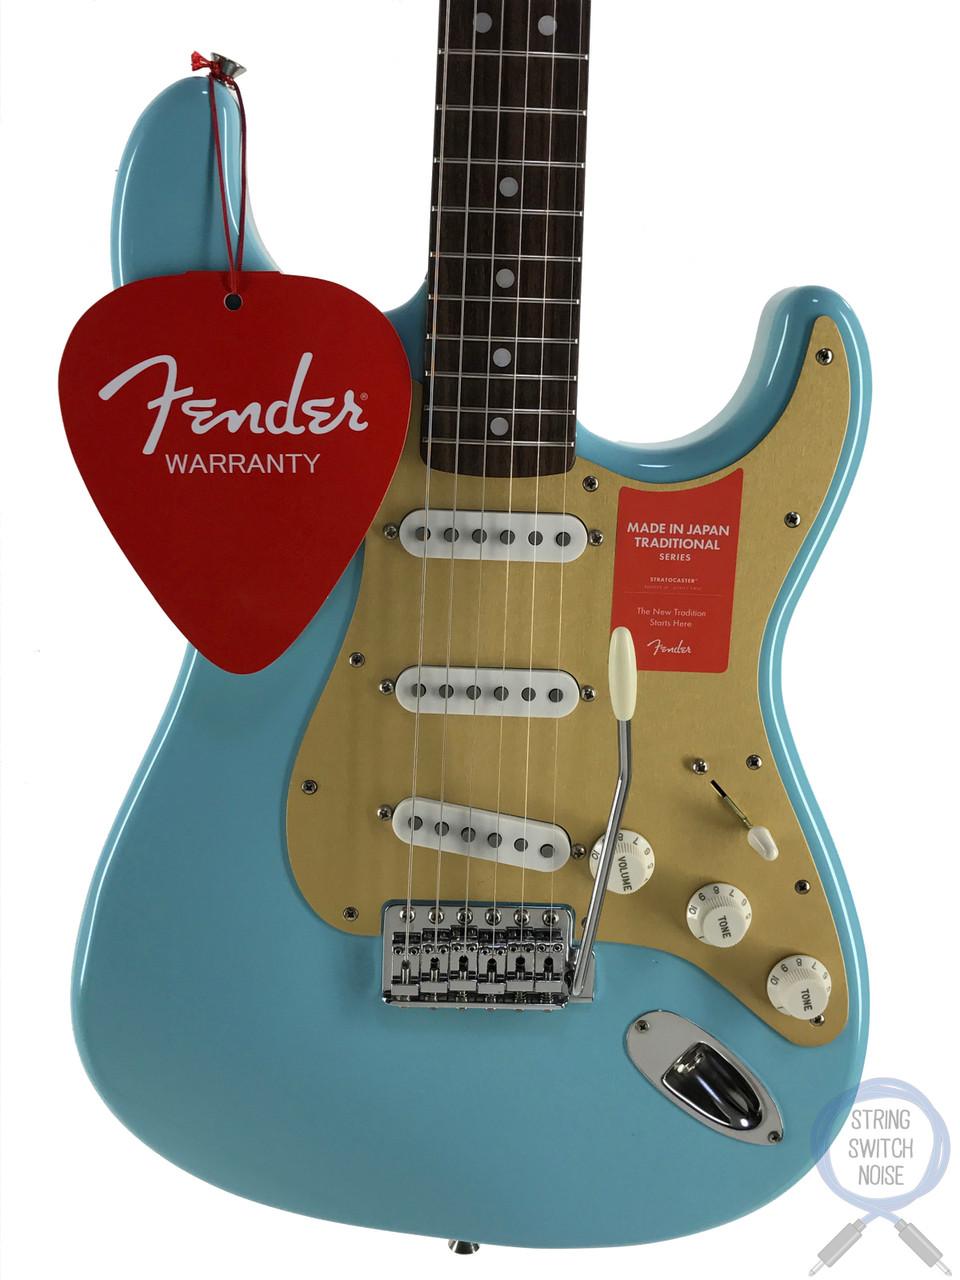 Fender Stratocaster, 70's, Sonic Blue, USA CUSTOM PUPS, Massive Upgrades,  AS NEW